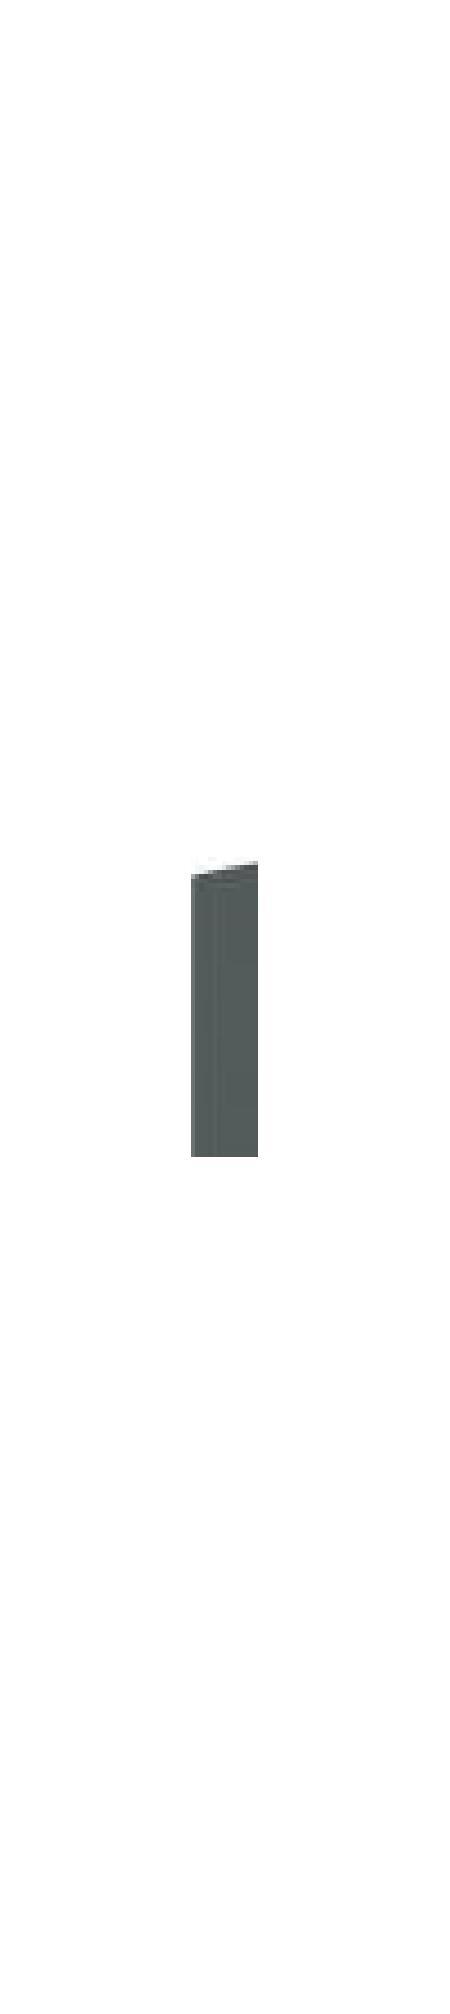 BIOGANCE Биоганс лосьон для ушей гигиенический / Biogance Lotion Des Oreilles (Clean Ears) 100 мл, BGLO100-8345